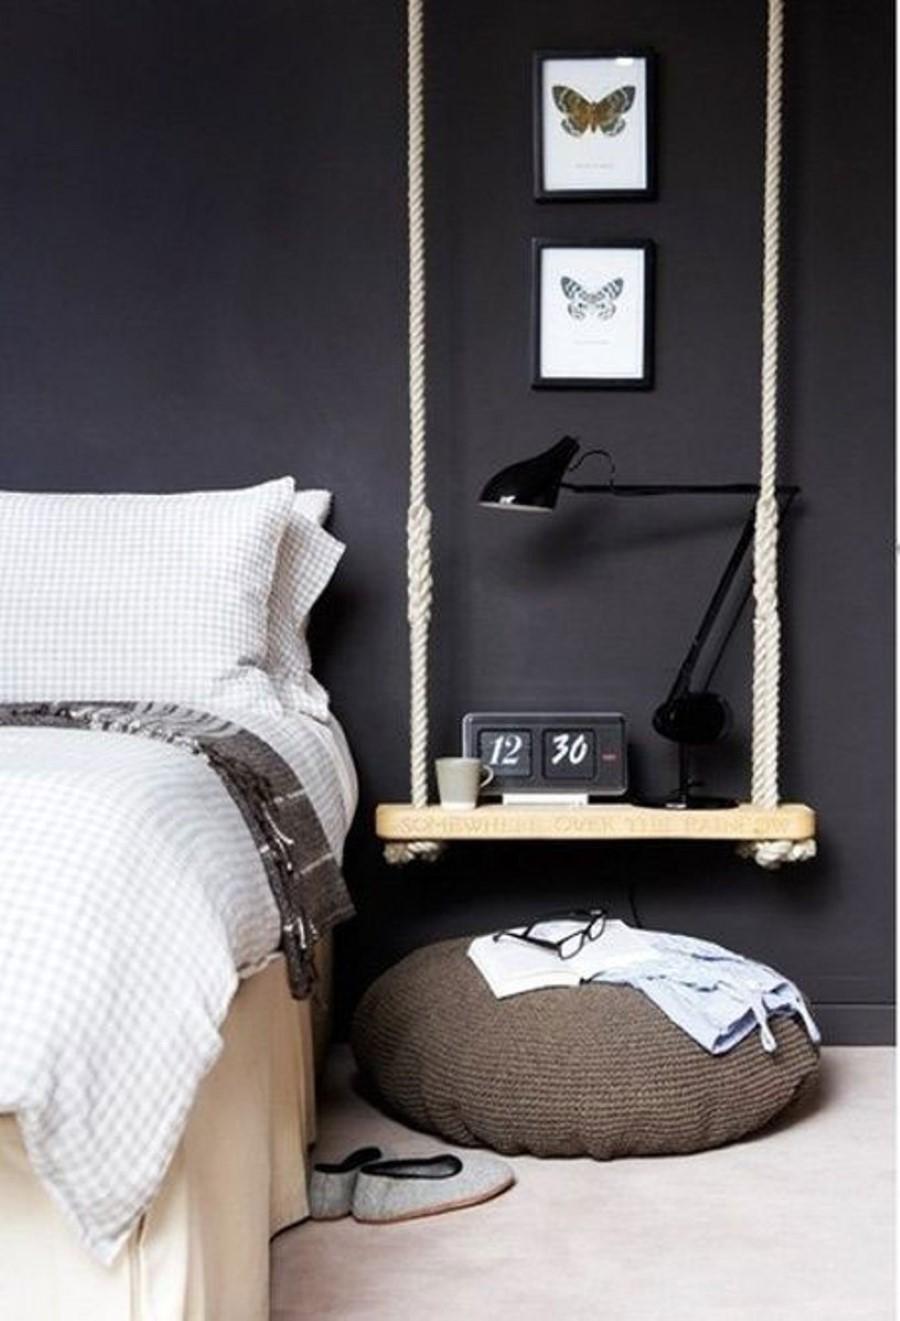 Alternative & Inspiring Bedside Tables